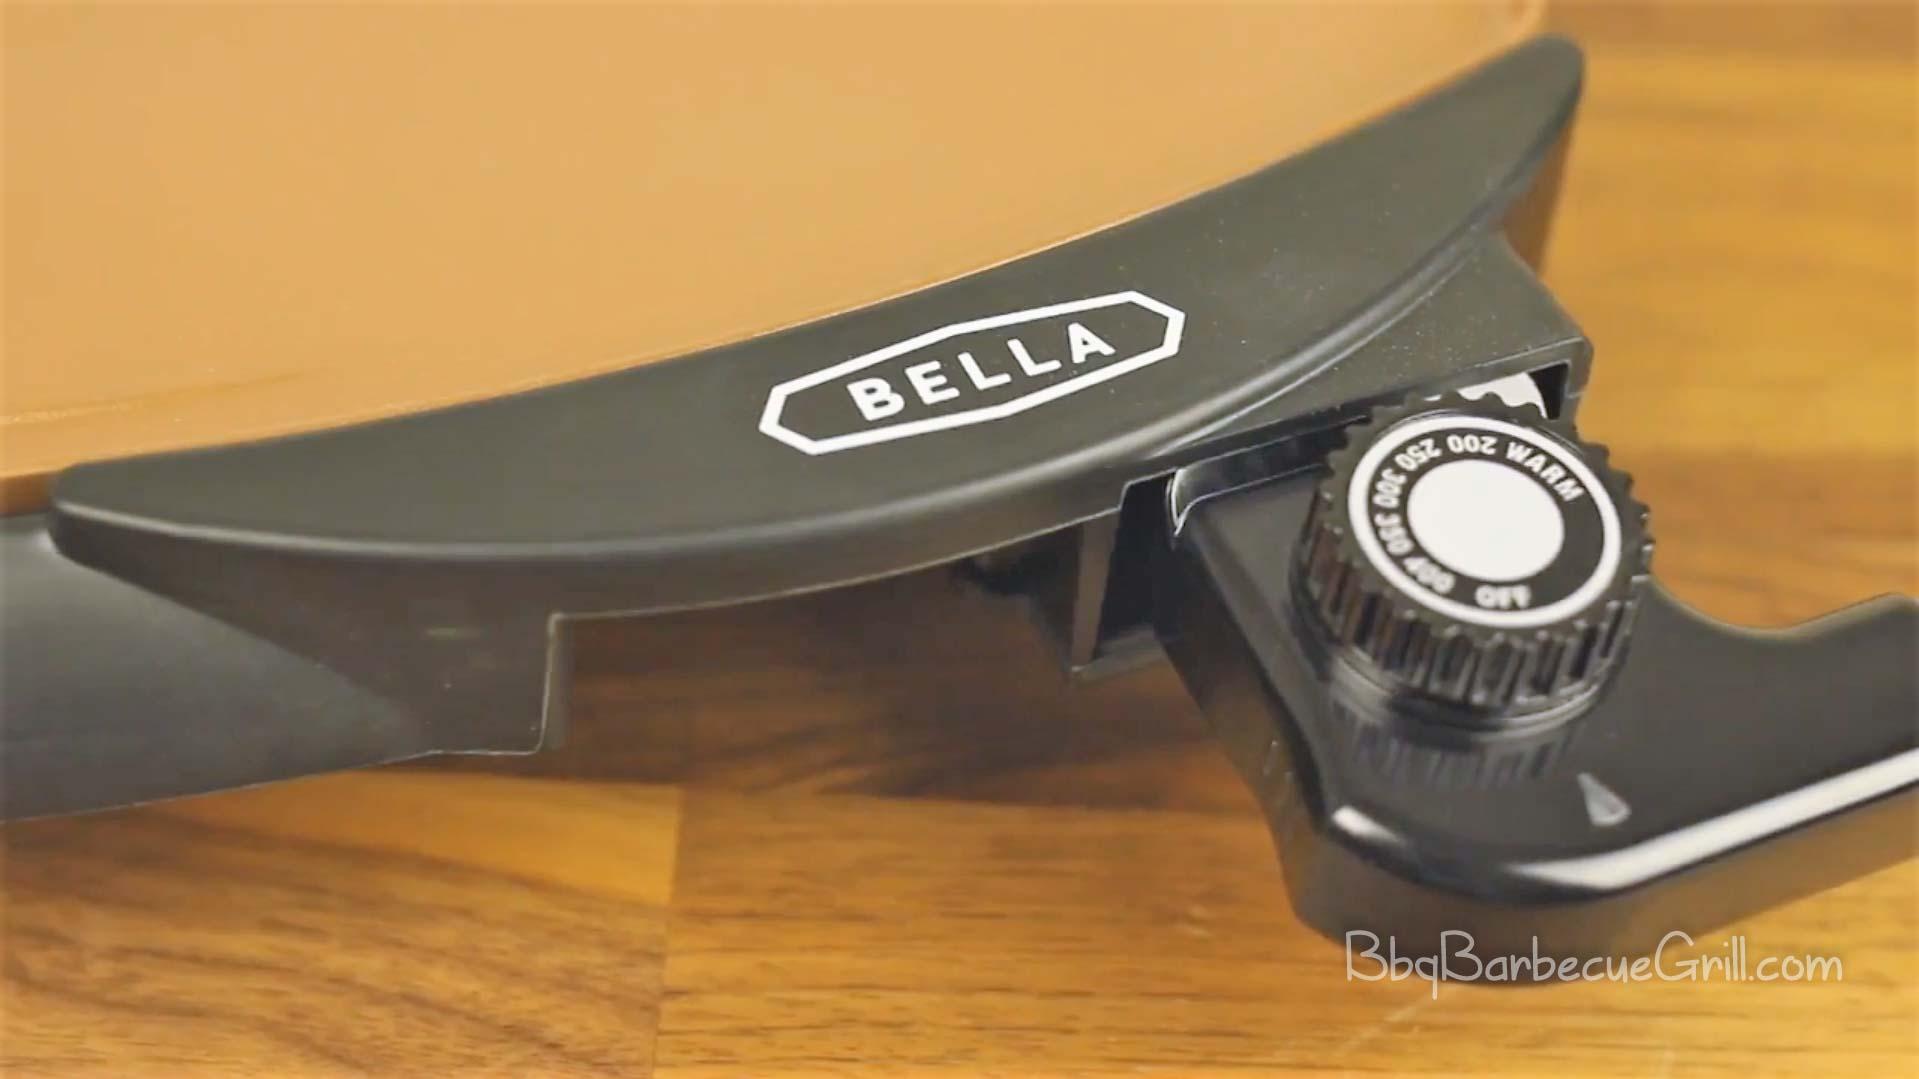 BELLA 14606 Copper Titanium Coated Non-Stick Electric Griddle